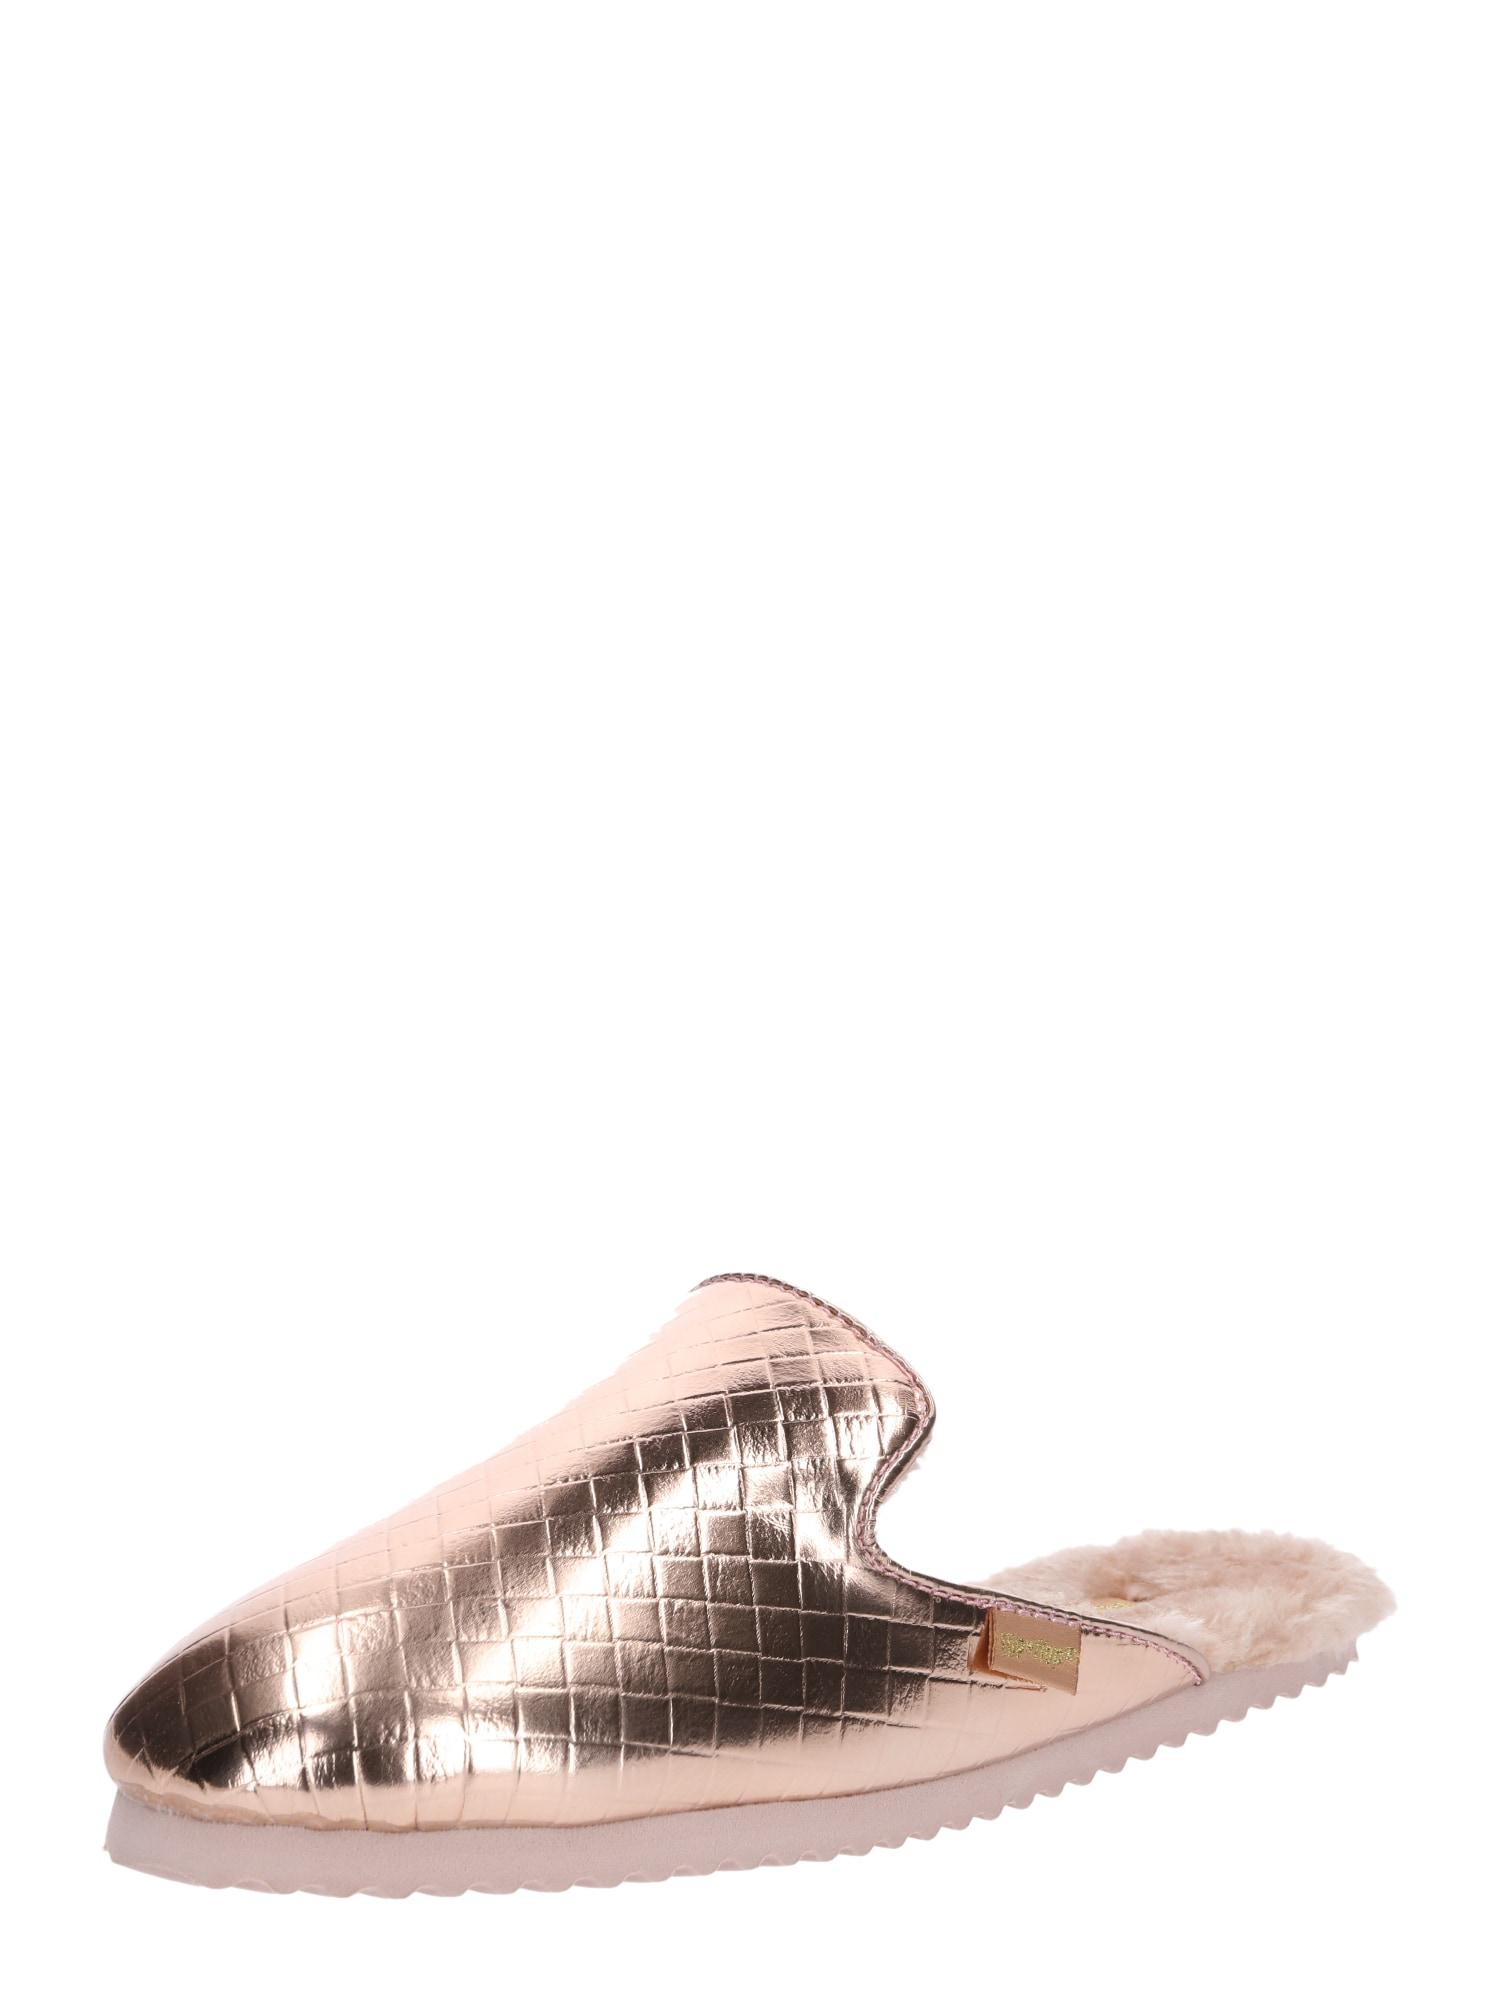 FLIPxFLOP Pantofle růžově zlatá FLIP*FLOP